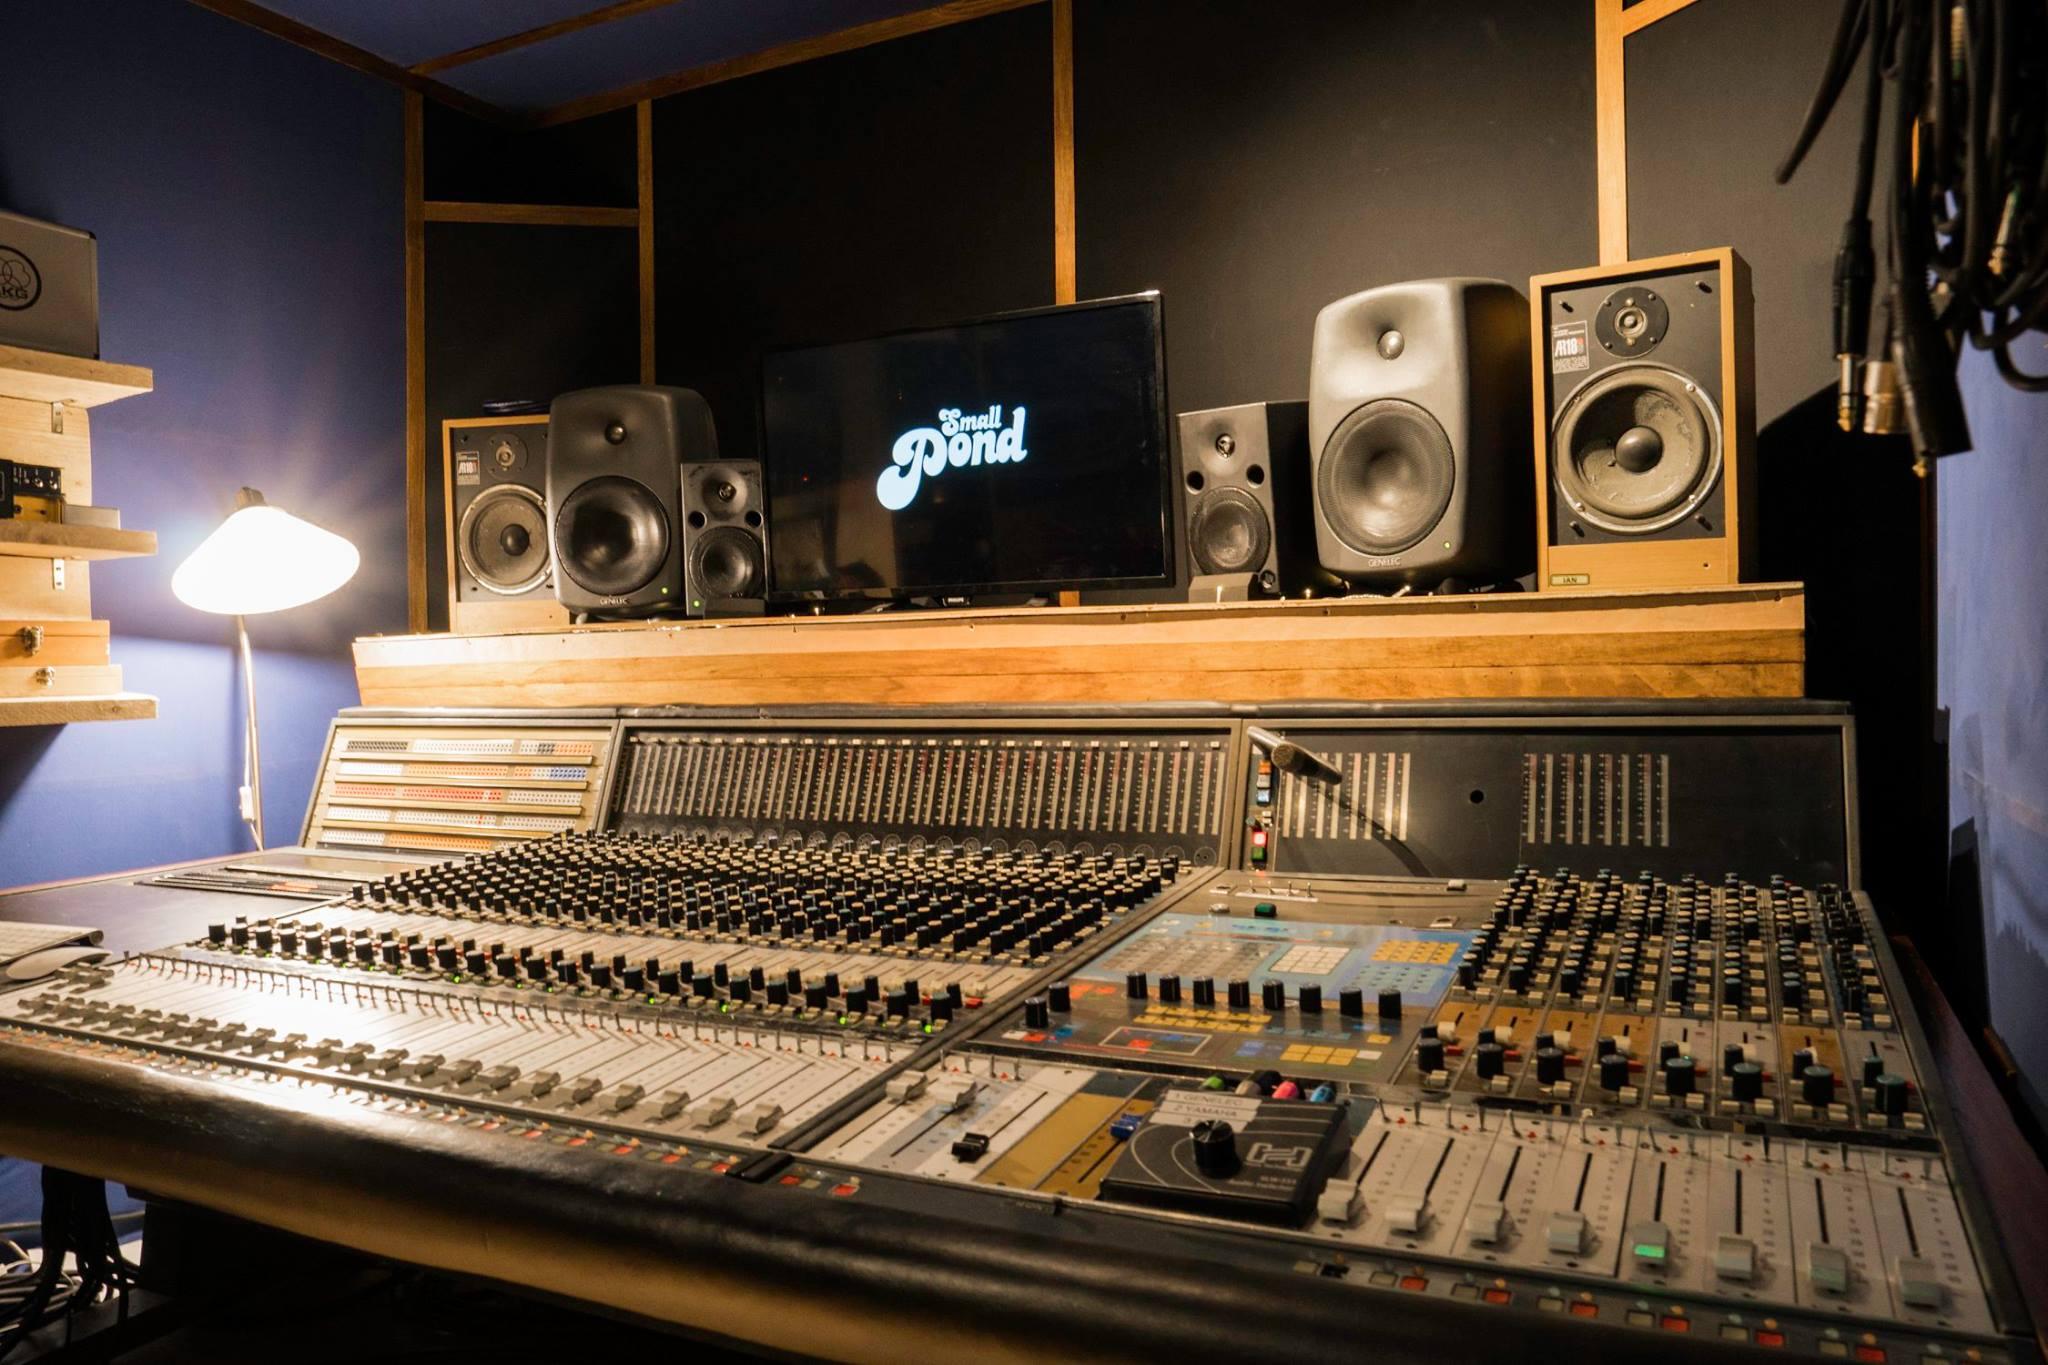 Small Pond studios